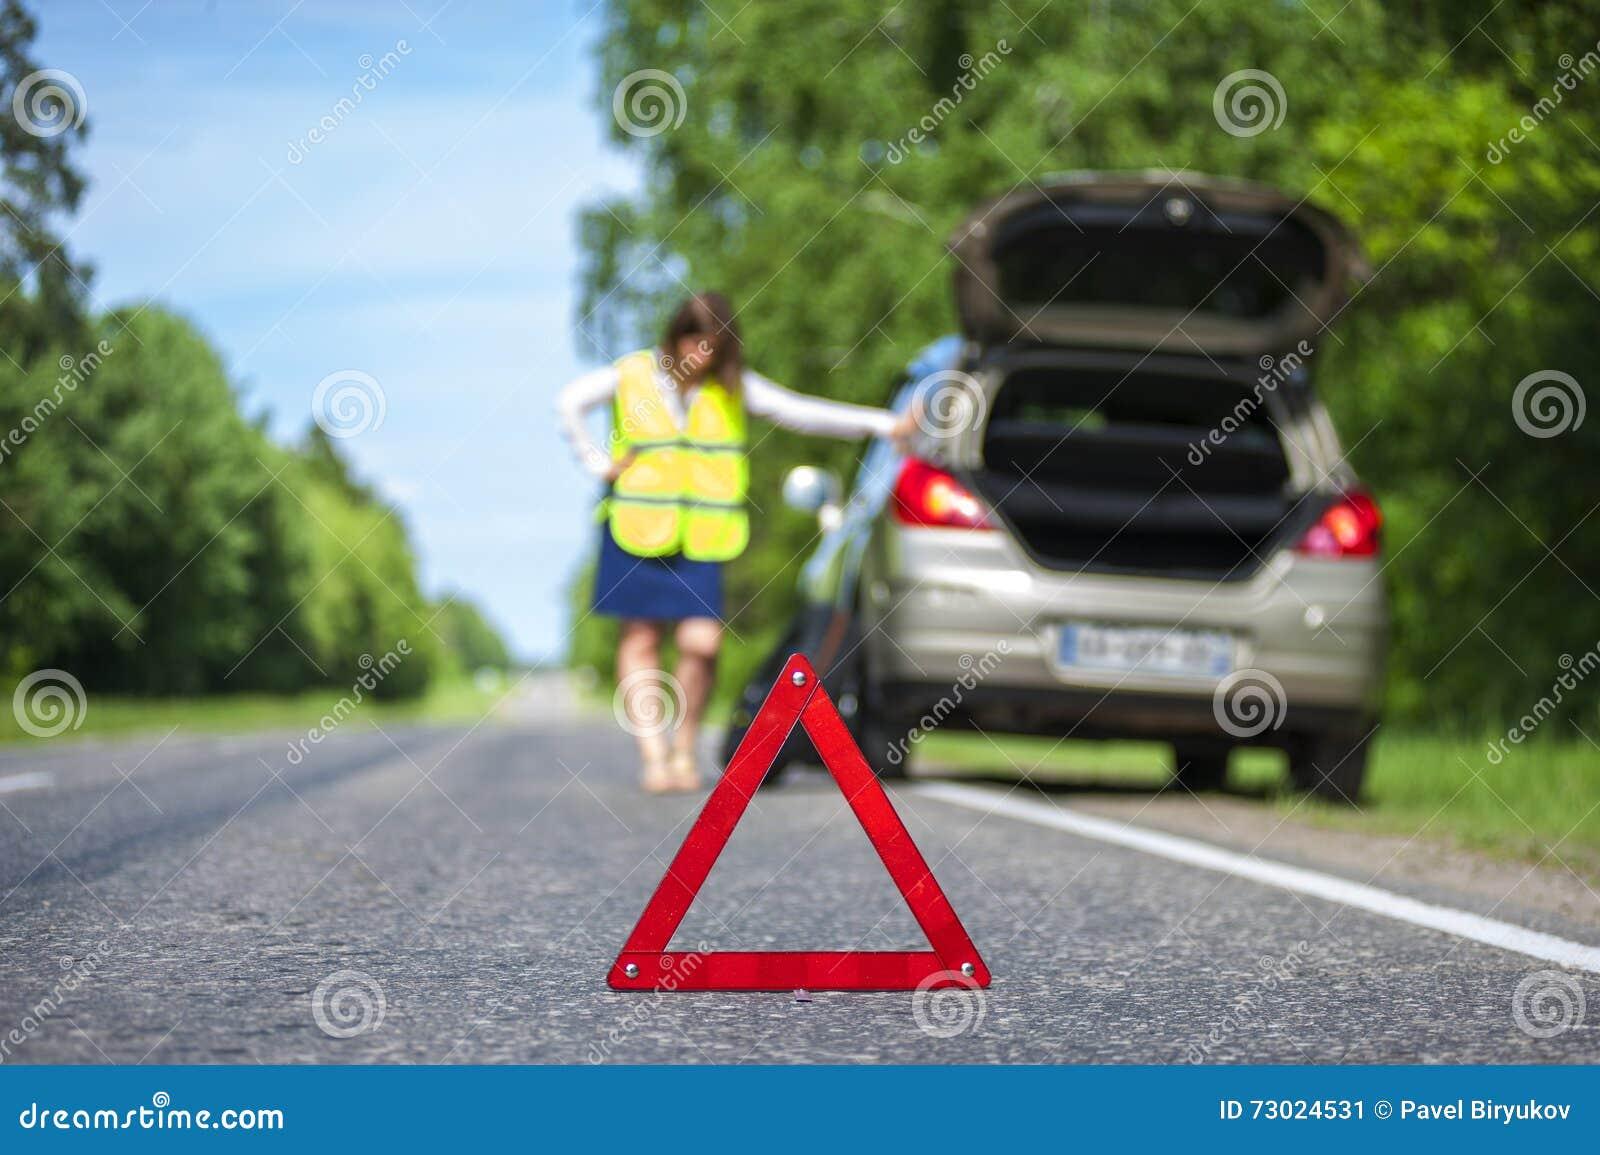 Mujer en chaleco reflexivo cerca del coche quebrado